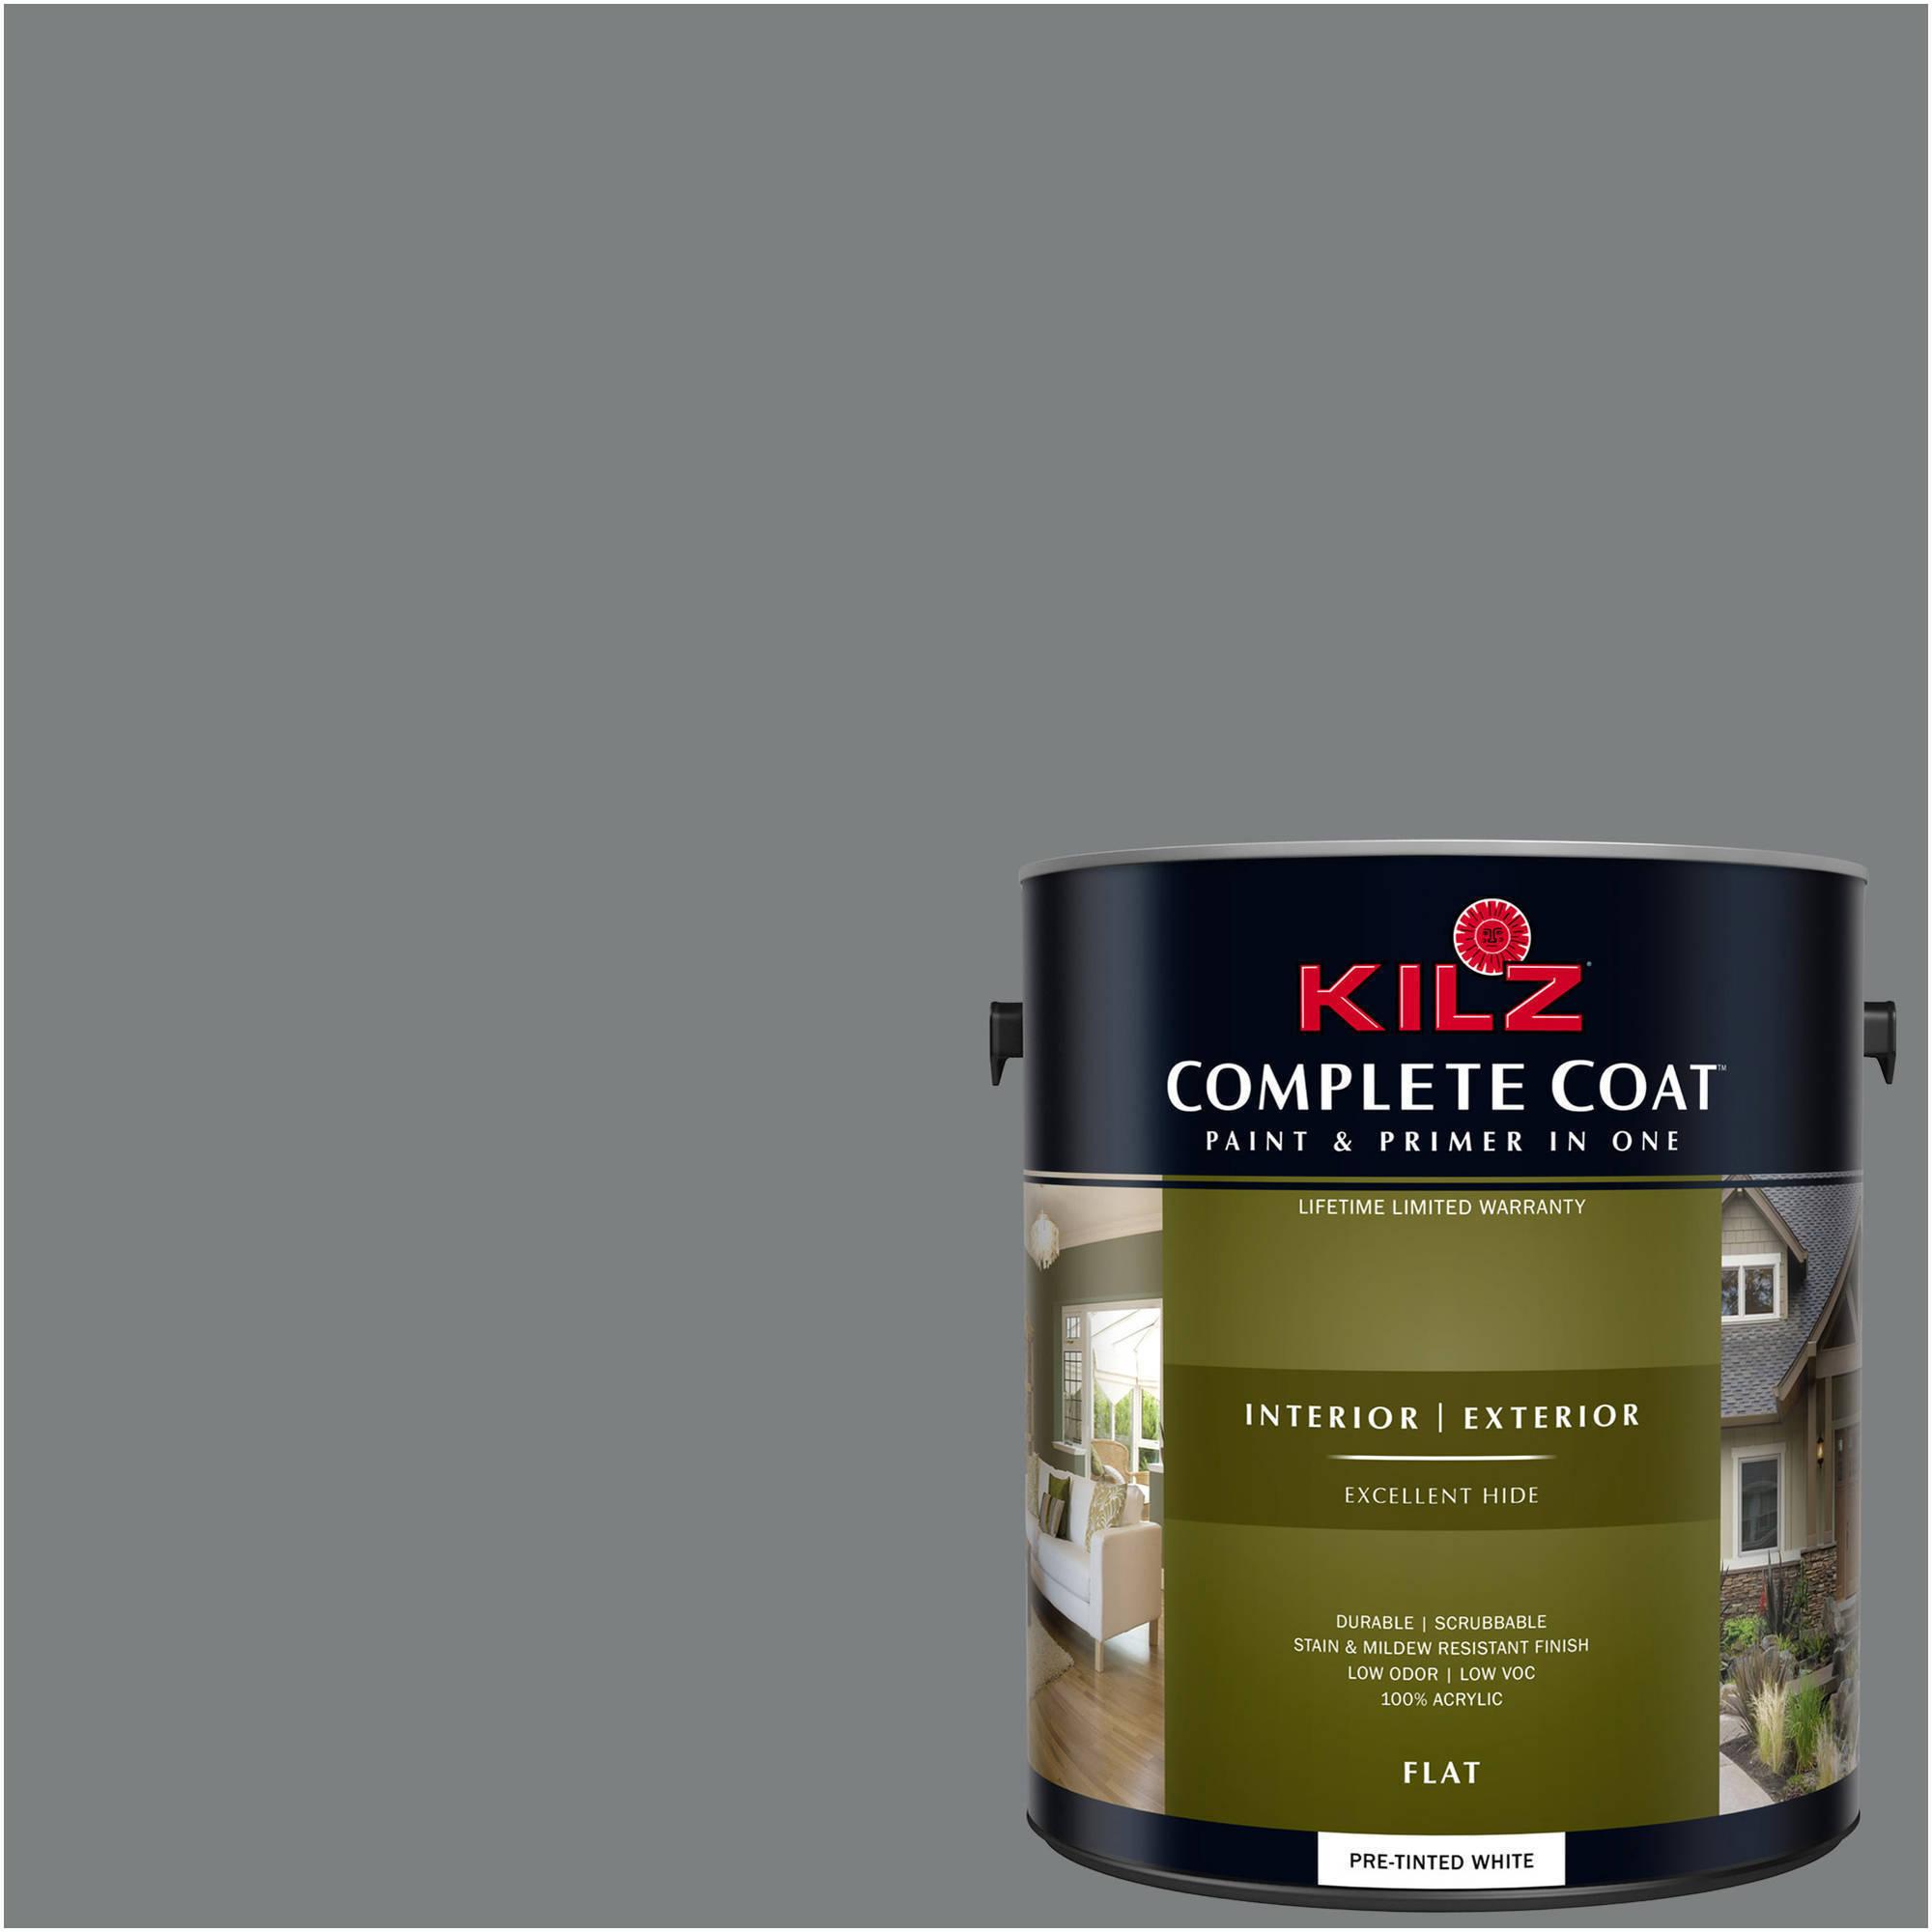 KILZ COMPLETE COAT Interior/Exterior Paint & Primer in One #RL230 Chipped Granite